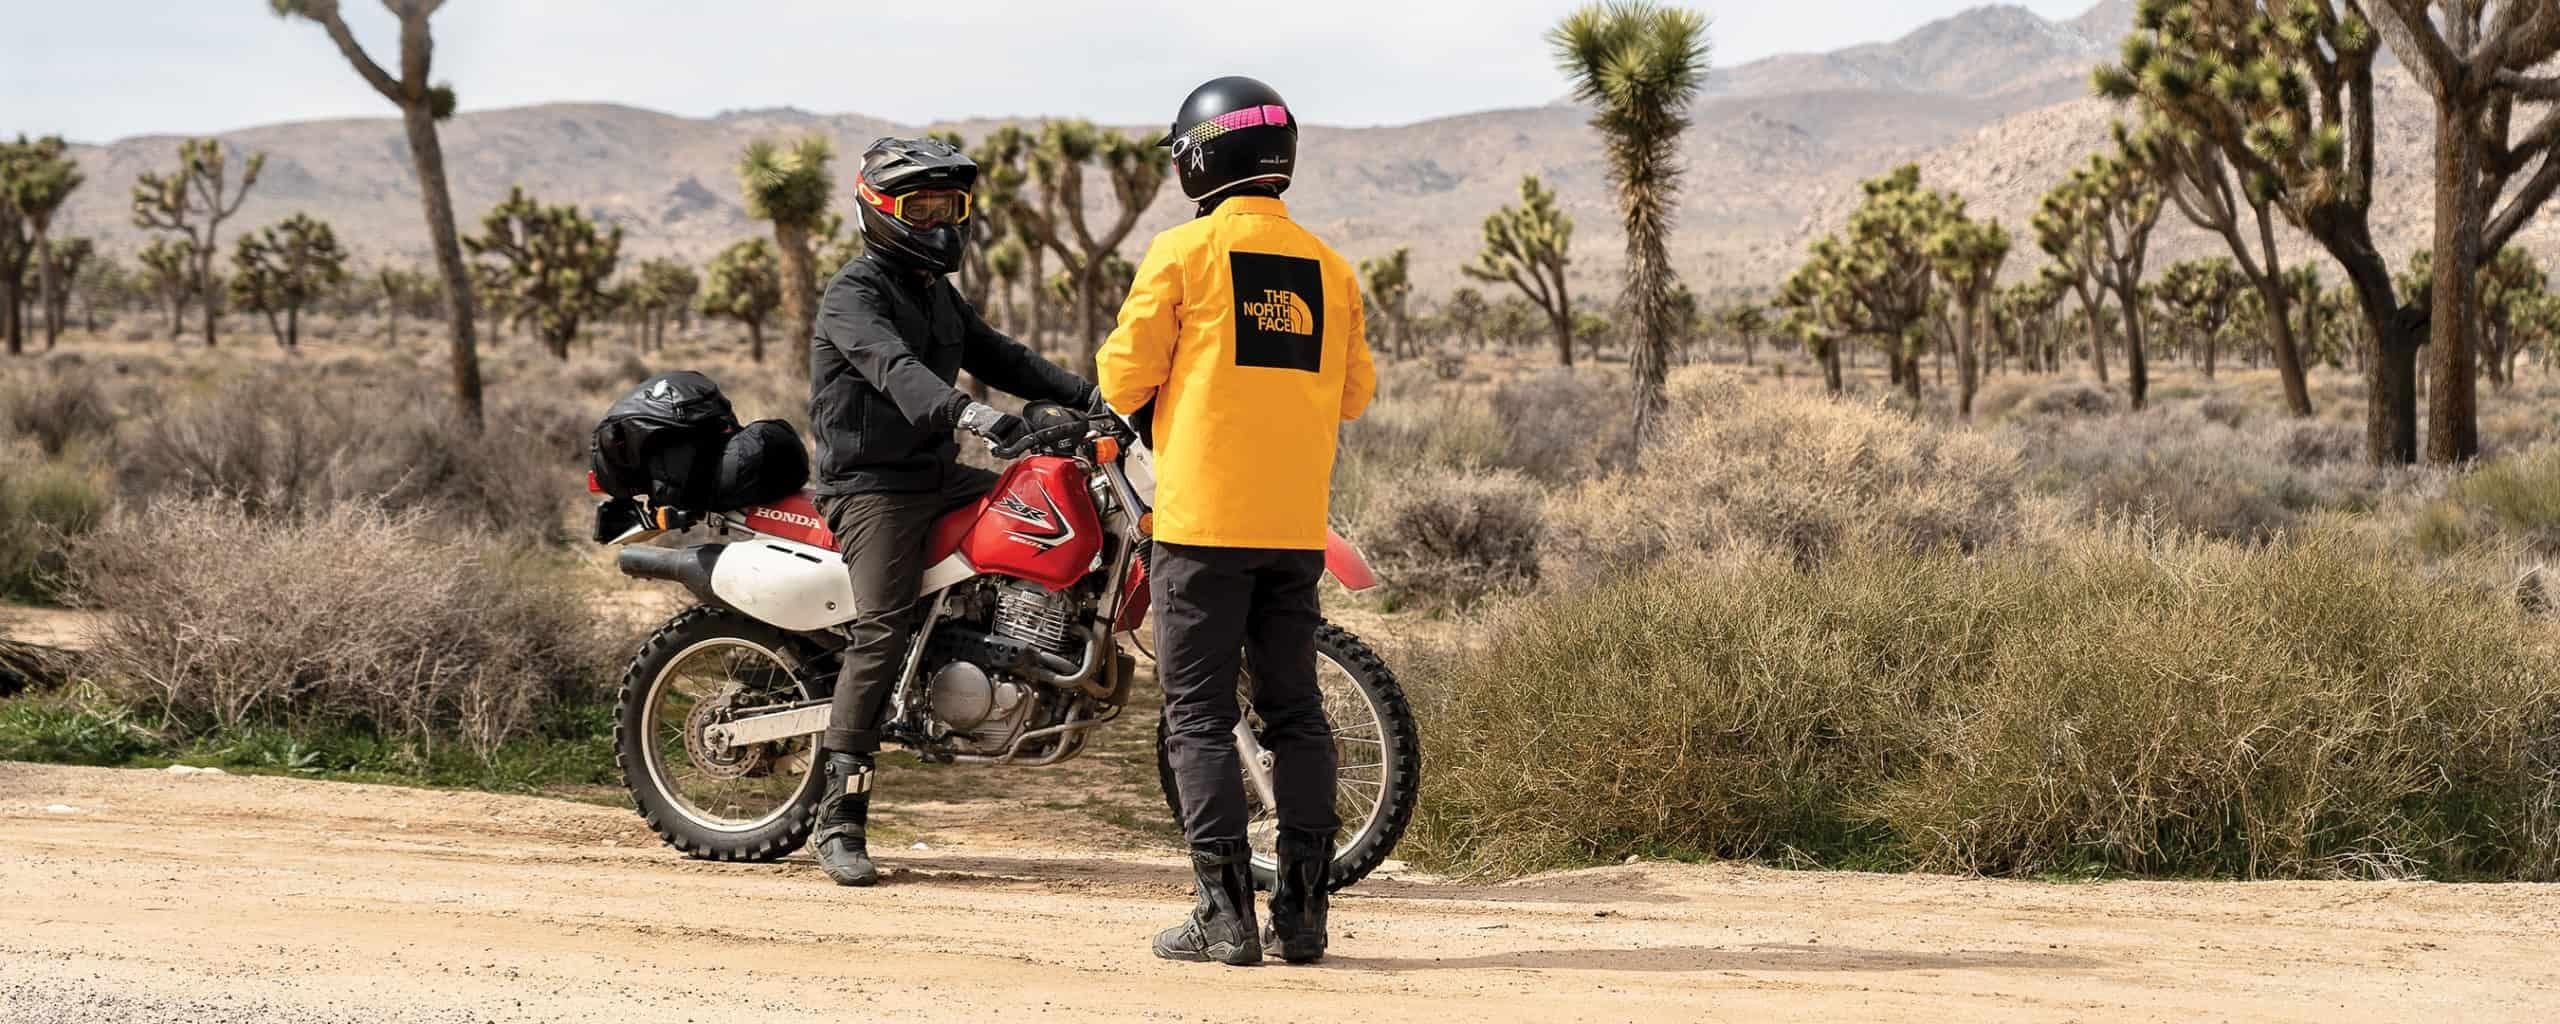 Never Stop Exploring, responsablement: de L.A. à Joshua Tree avec The North Face